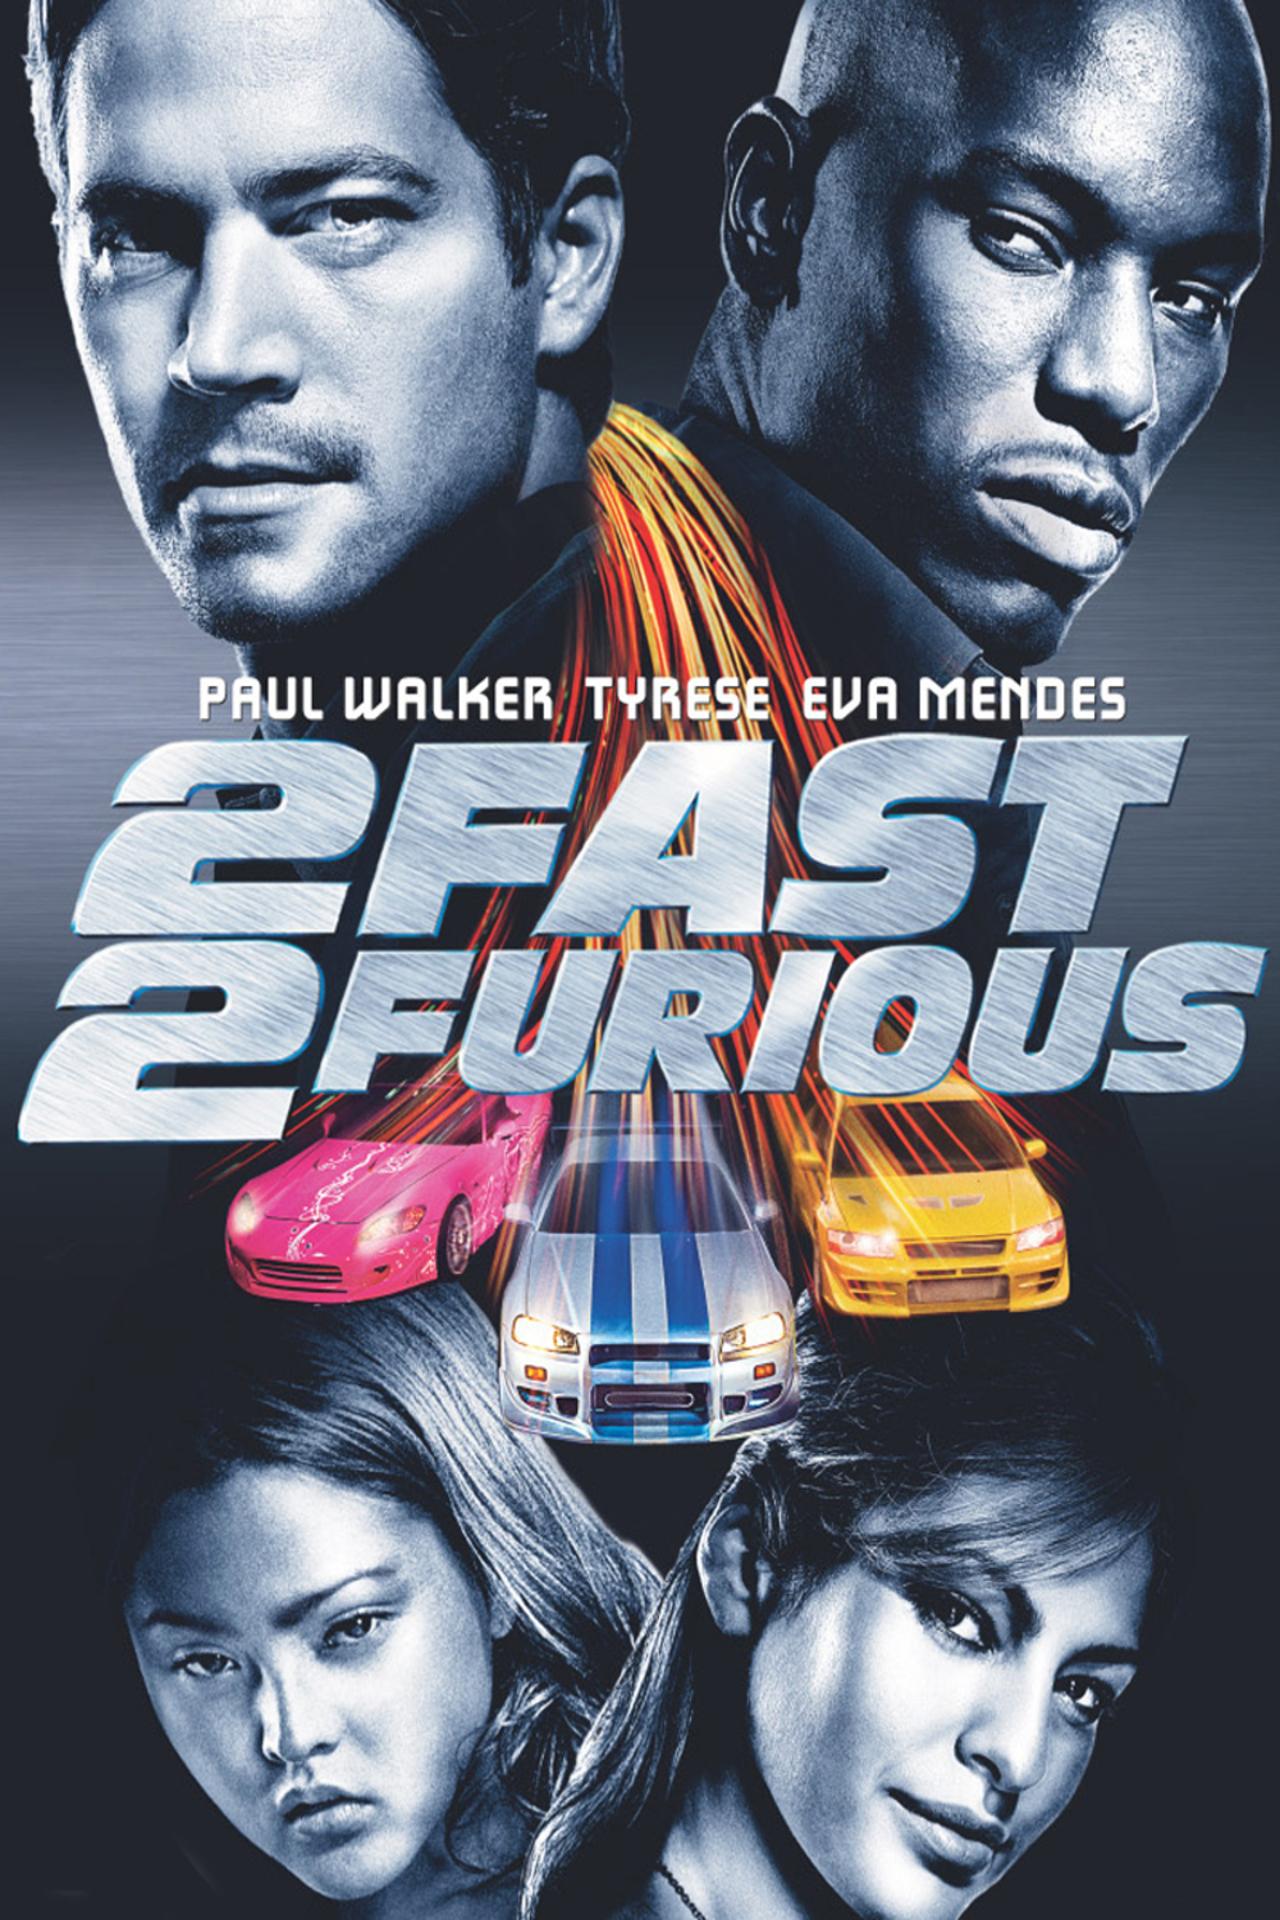 2 Fast 2 Furious kapak